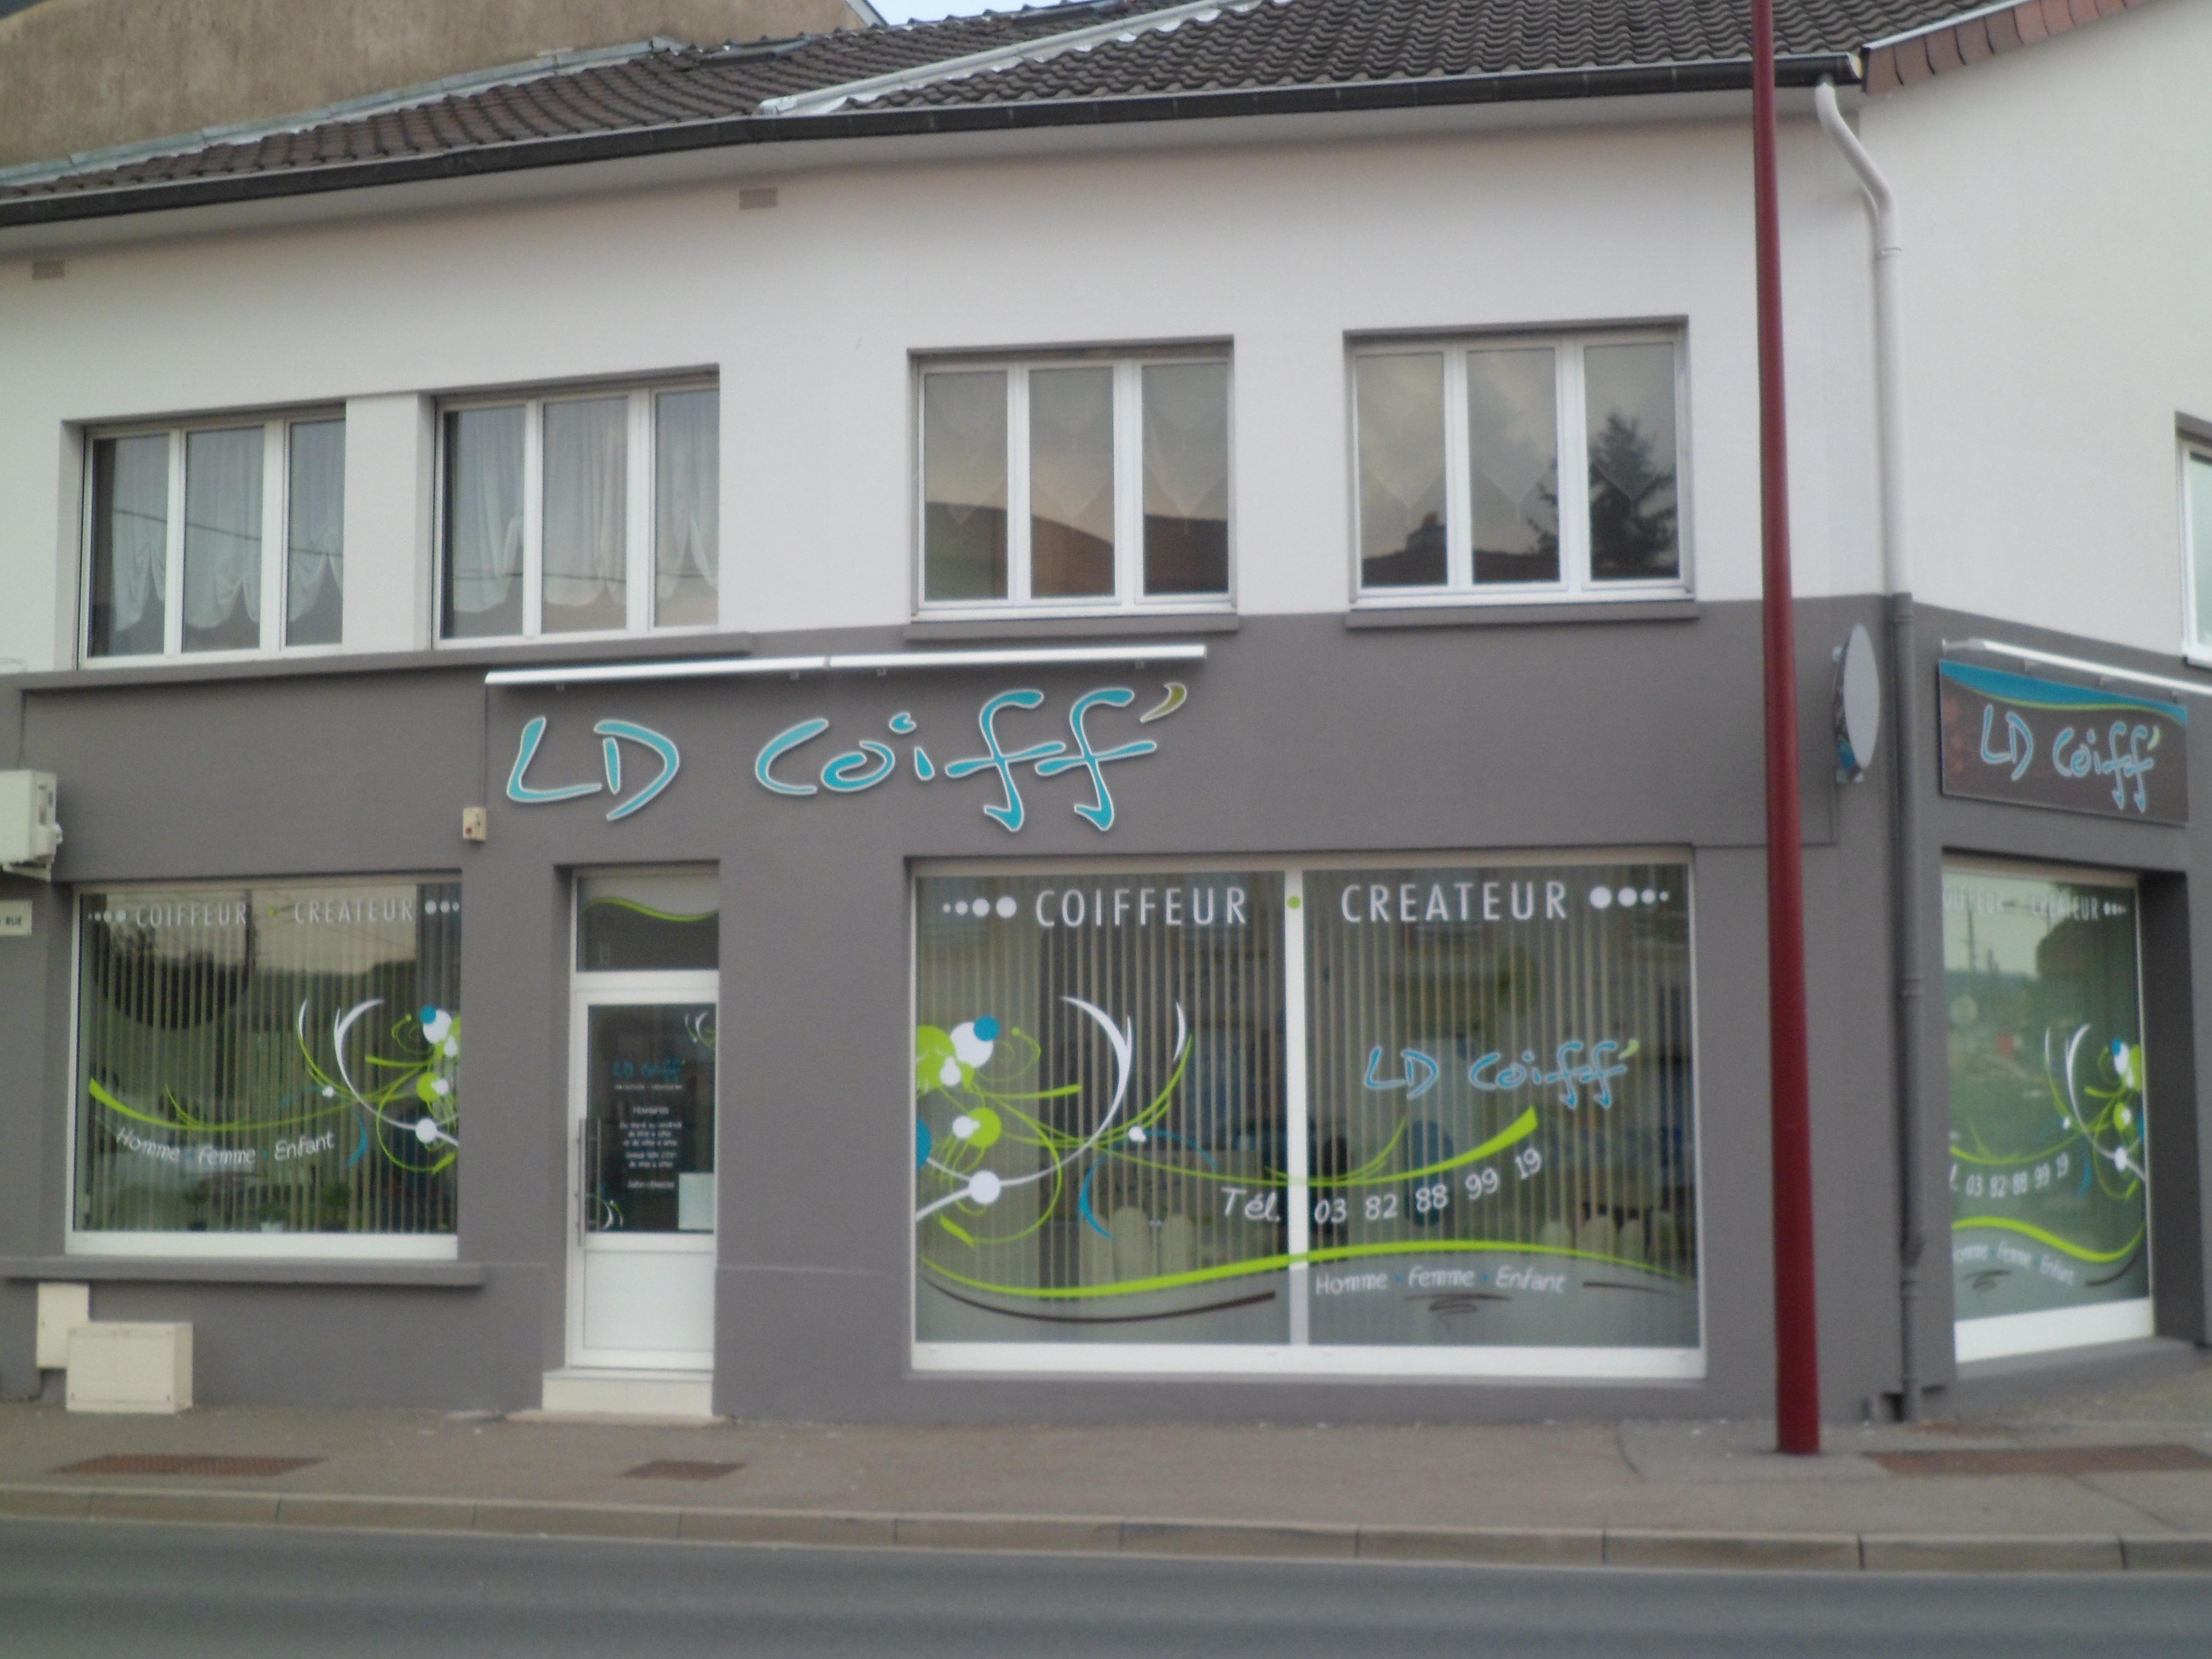 Ld Coiff'